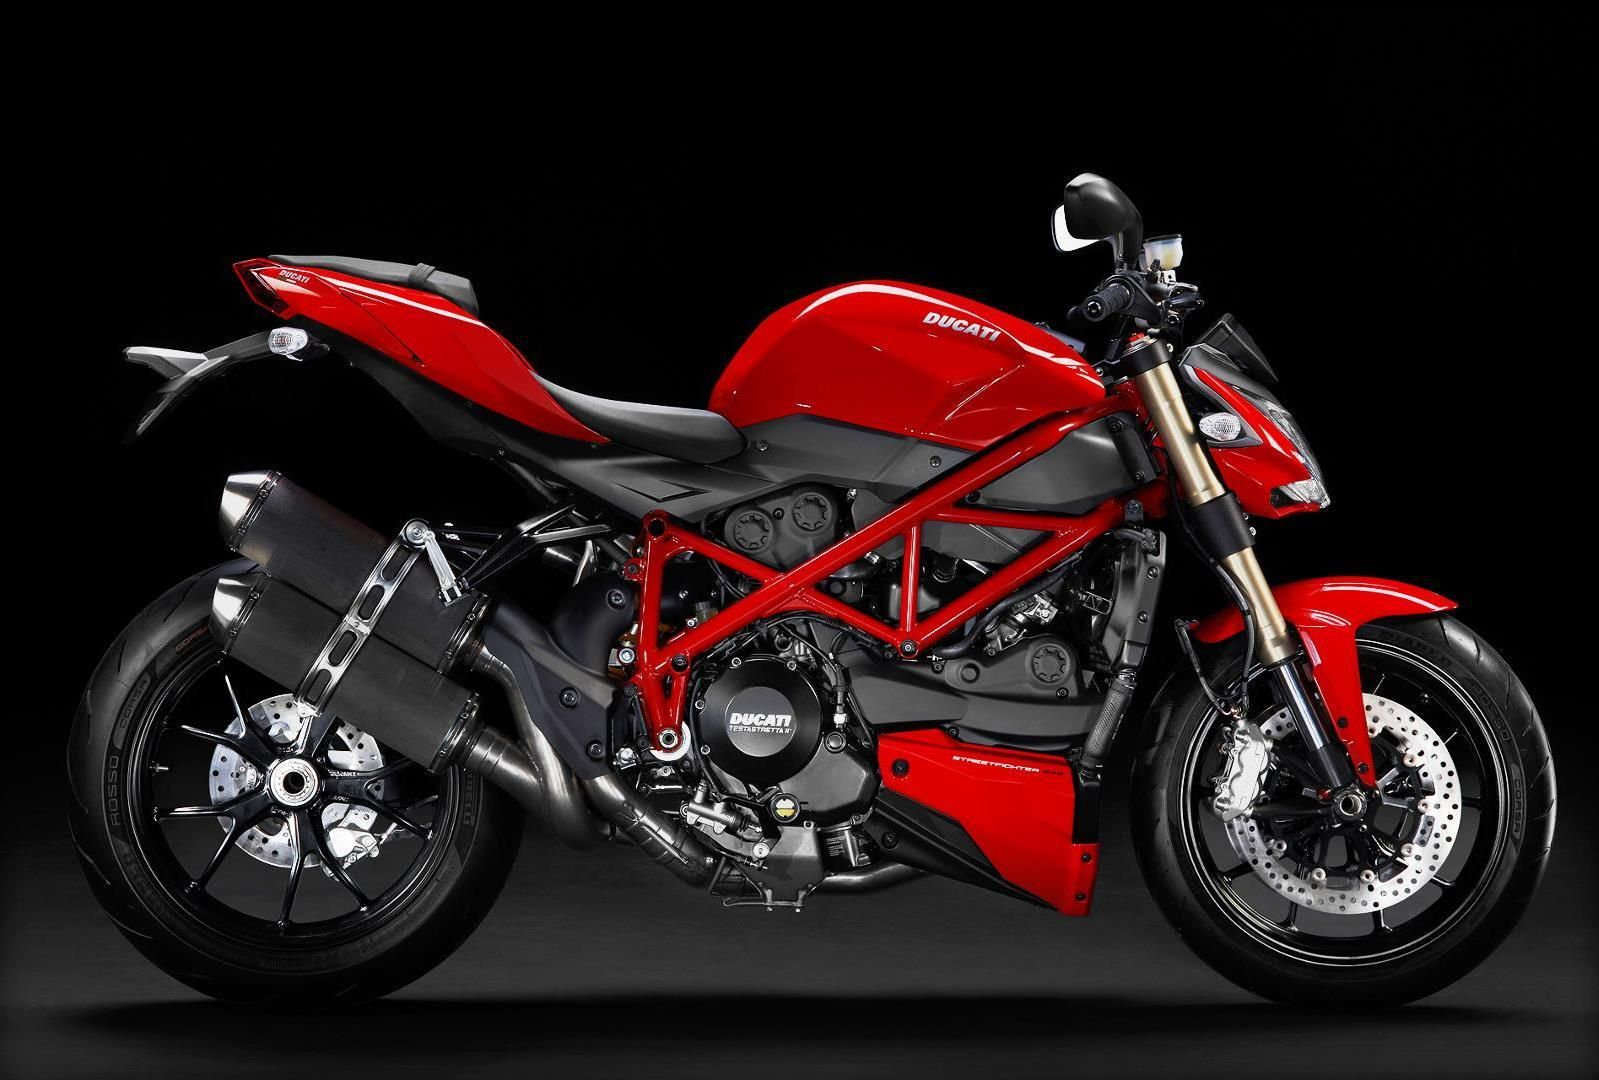 Ducati Streetfighter For Sale 848Motorcycle WallpaperBmw